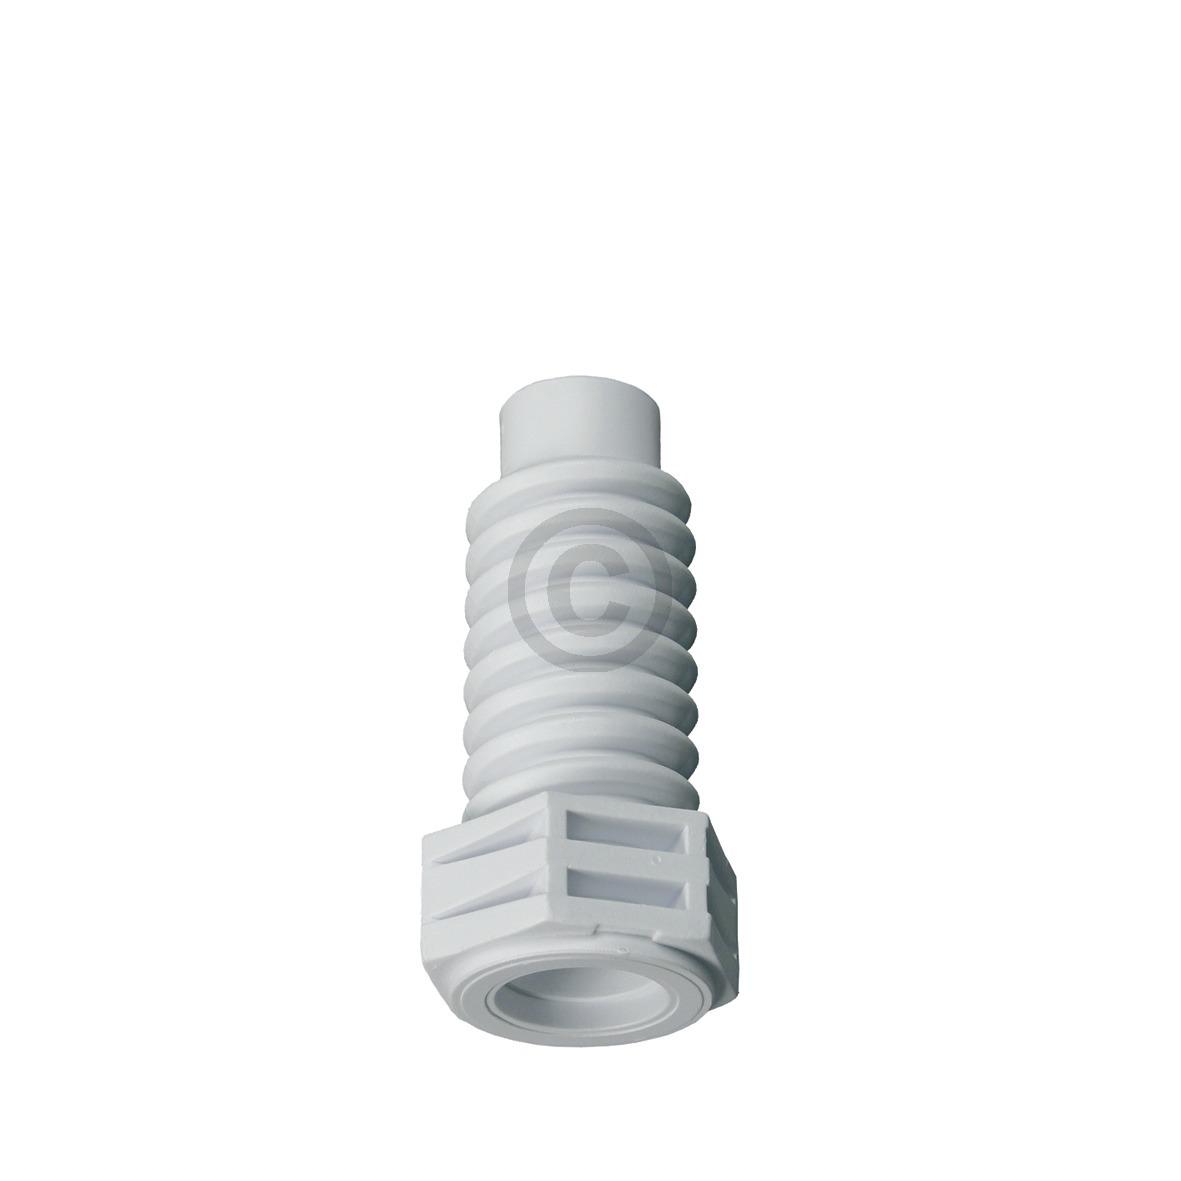 Gerätefuß verstellbar, weiß 481250018054 Bauknecht, Whirlpool, Ikea